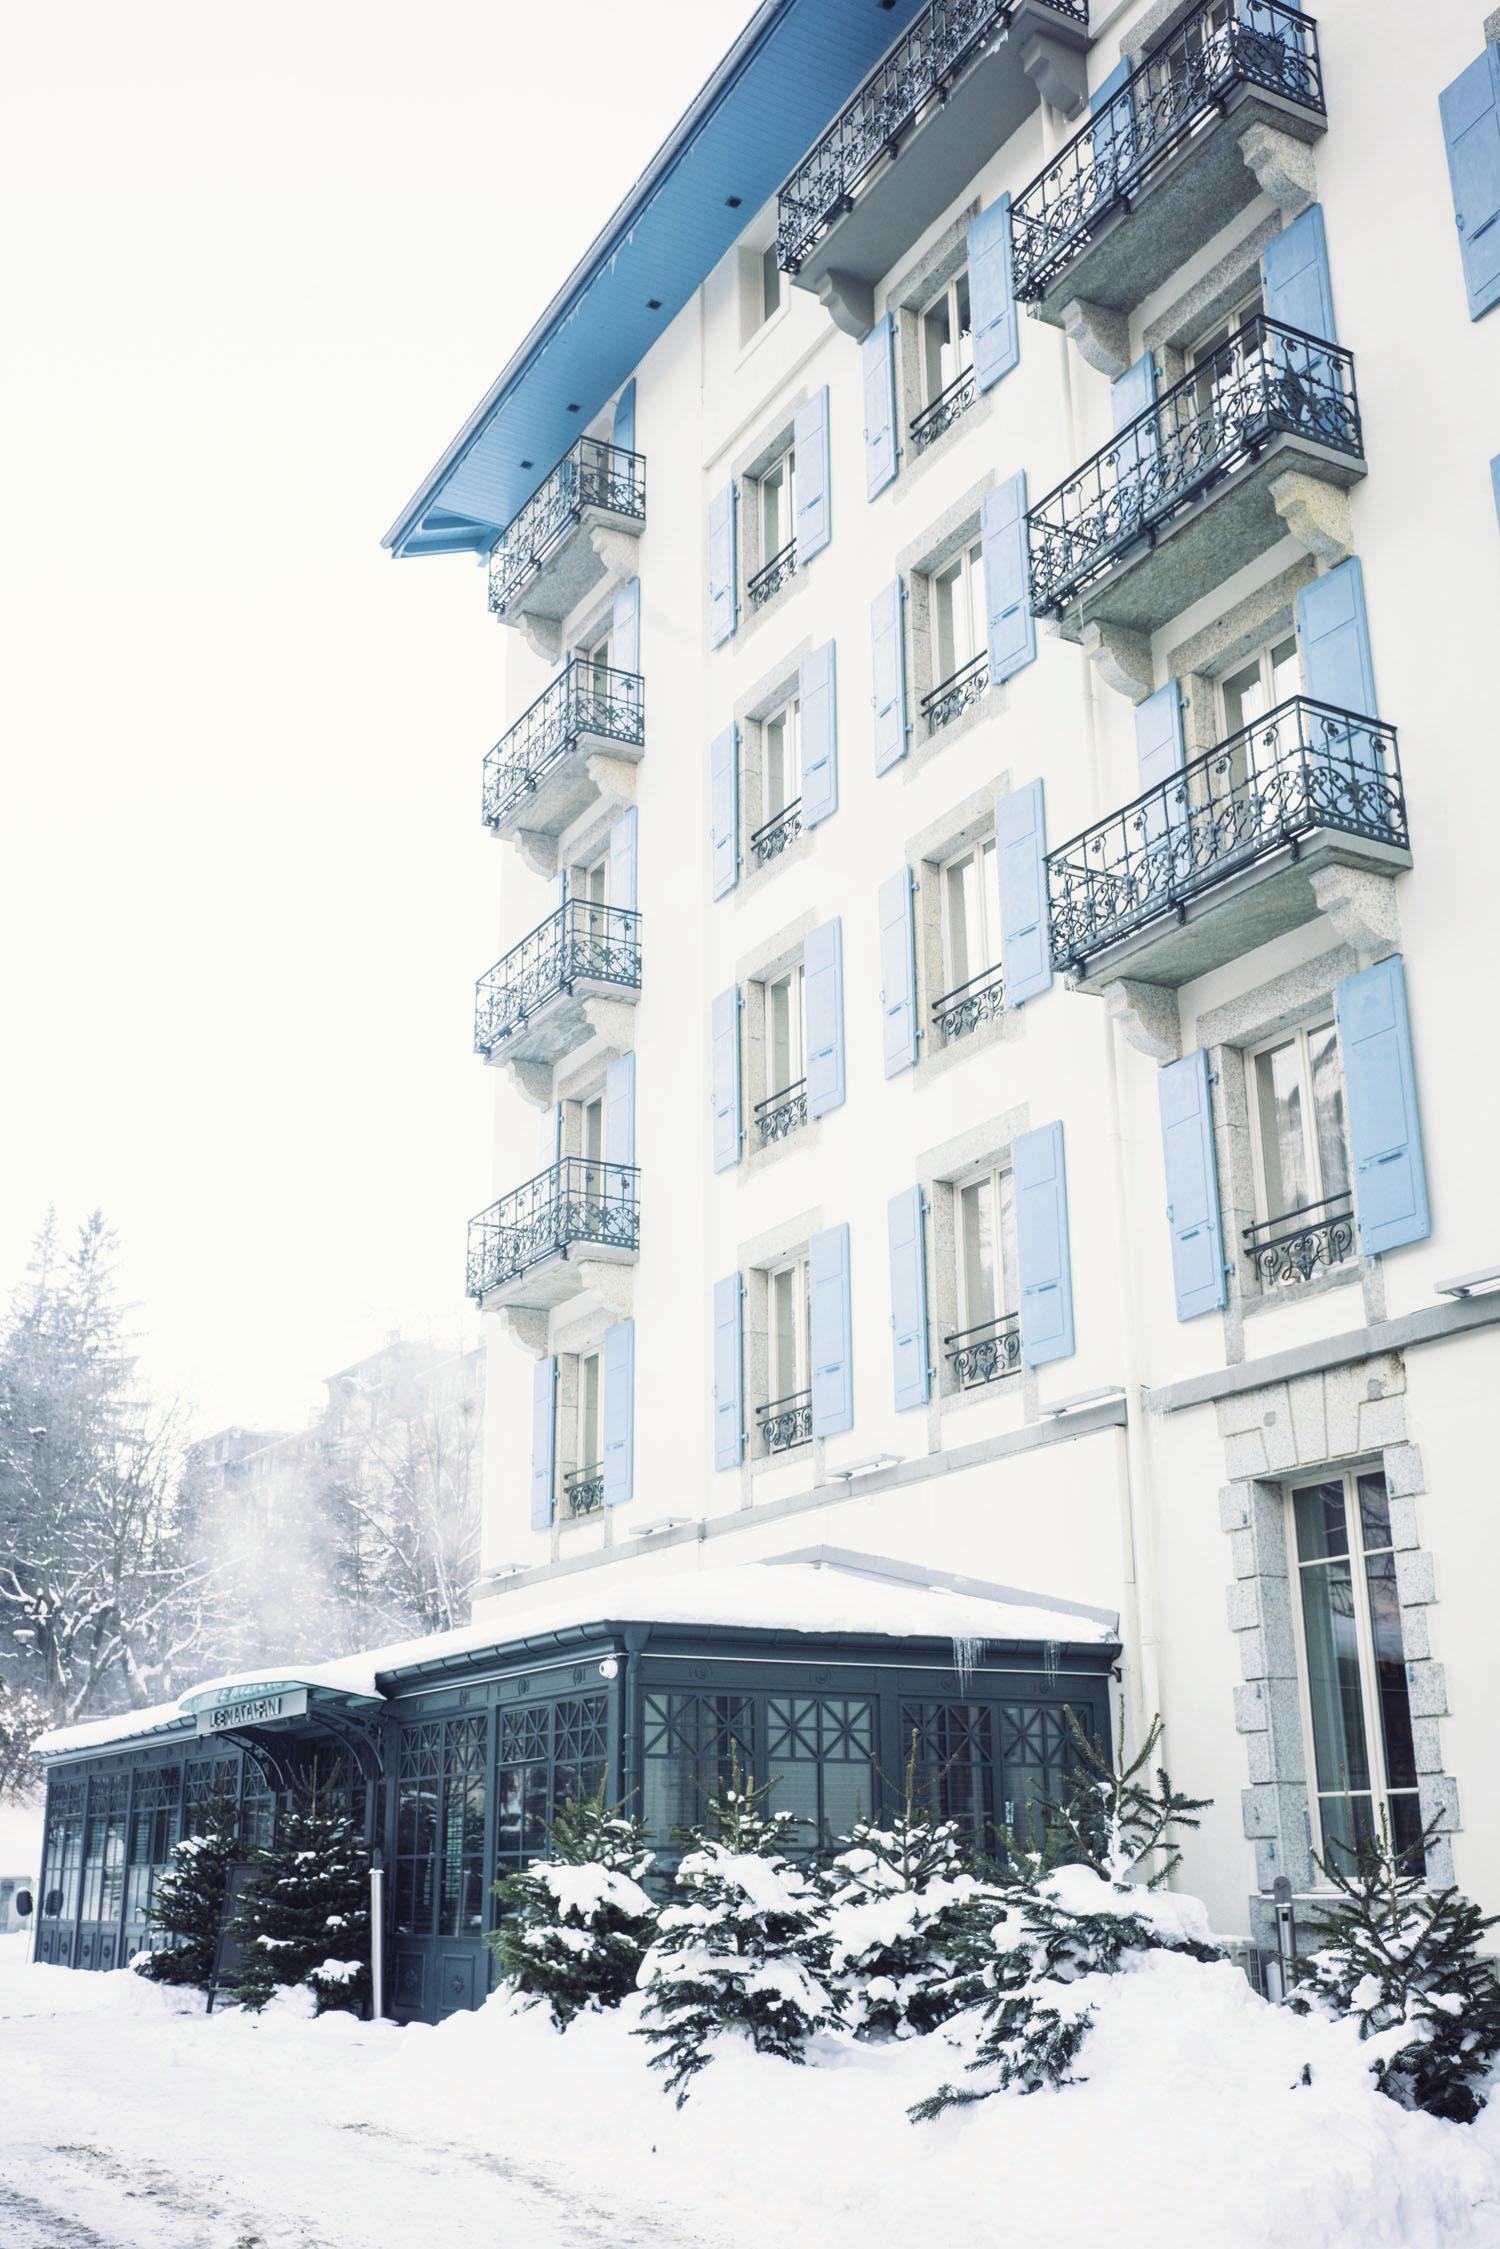 Hotel_Mont_Blanc_Chamonix_012